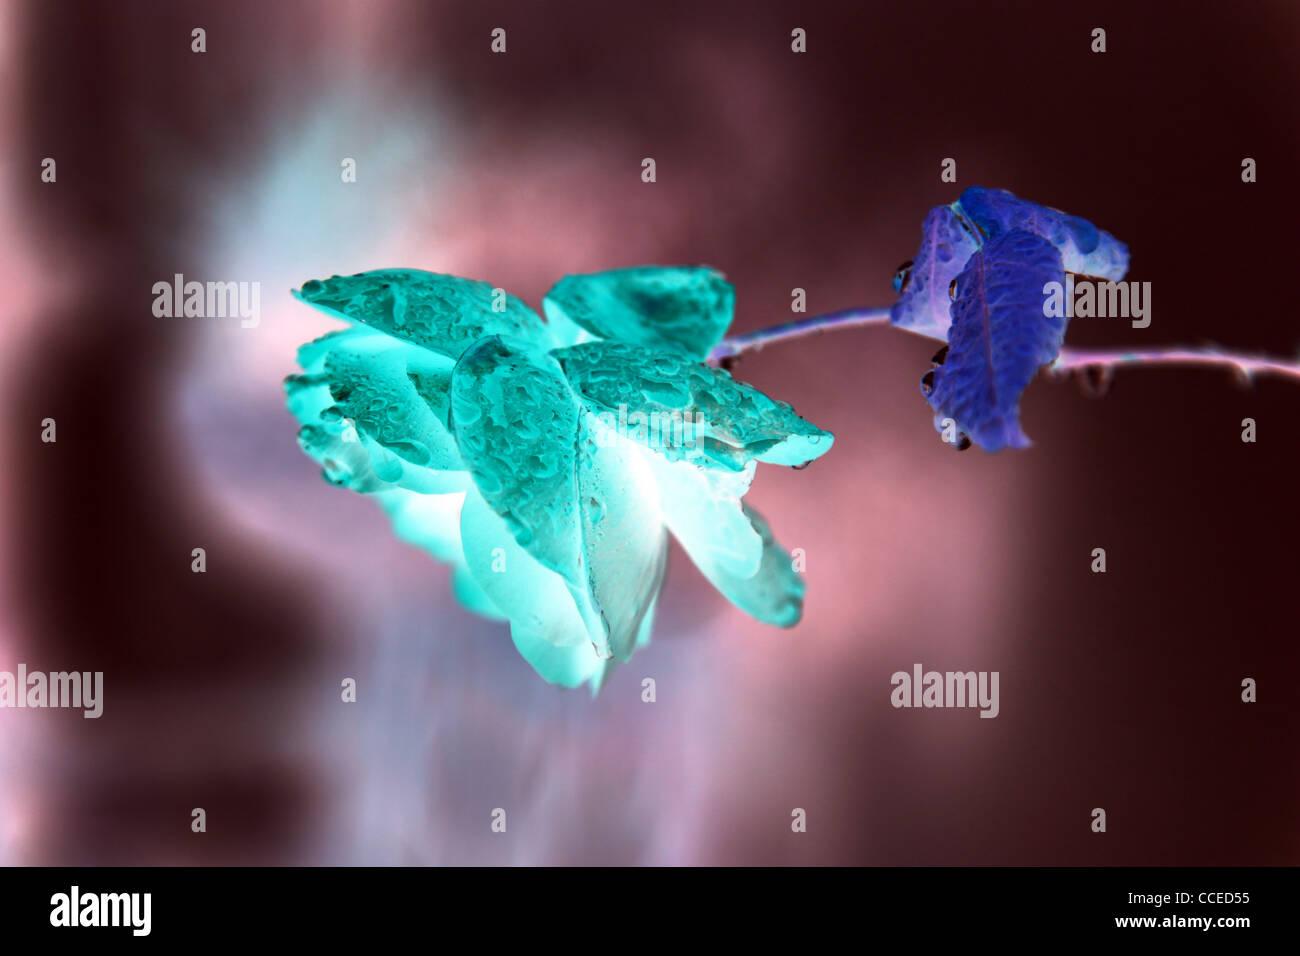 Stilleben,Rosa,Blume,digital,blau,rosa,lila,grün,Beleuchtung,Tau,Regen,positiv,negativ,Tautropfen,Regentropfen,Kunst,arte,Blume Imagen De Stock